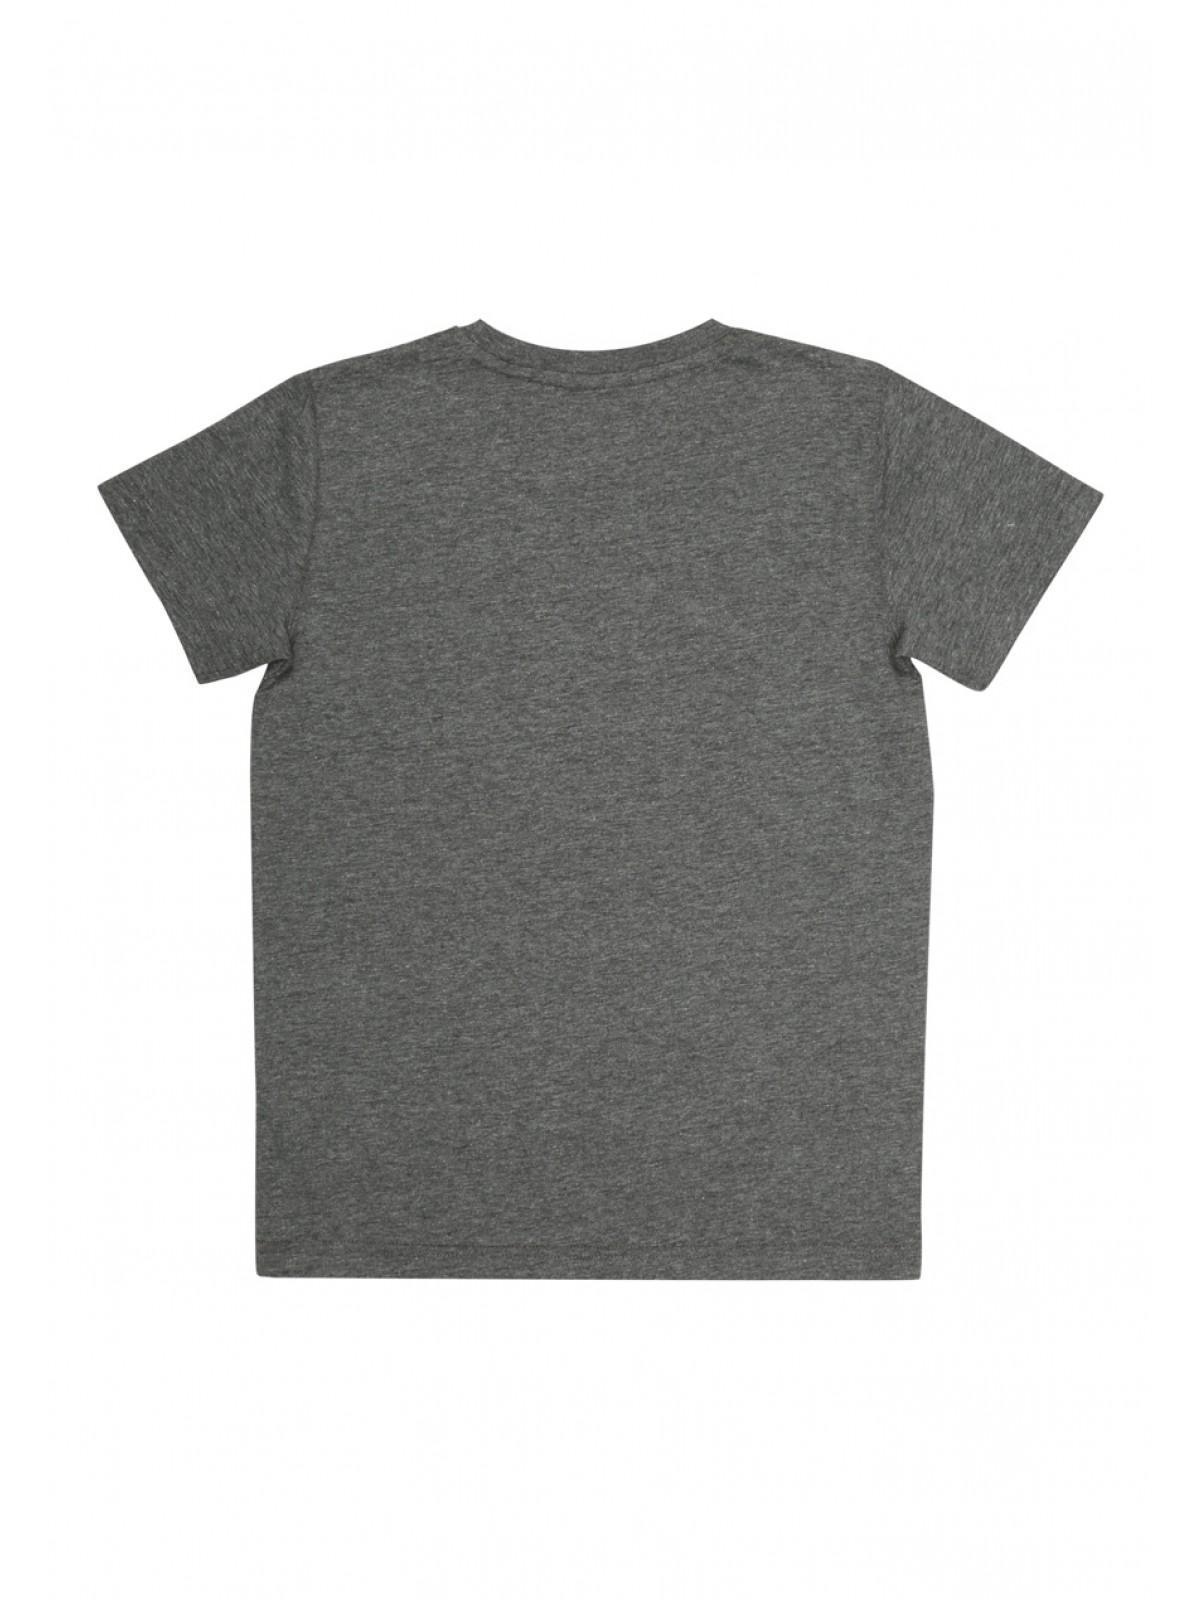 3068ee73b6 Mens Older Boys Spongebob T Shirt | Peacocks